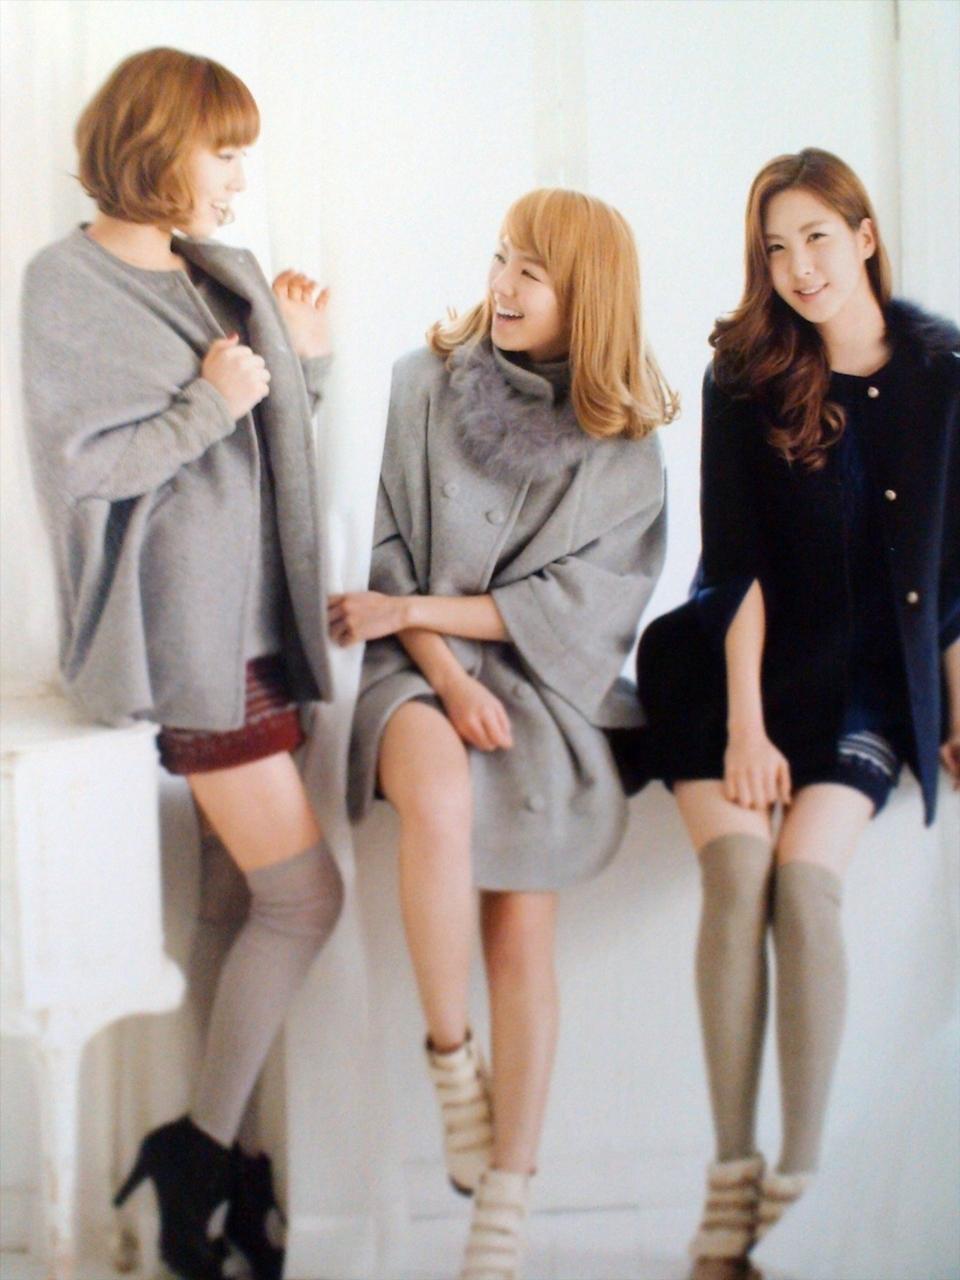 Snsd Wallpaper on Girls Generation Snsd Celebrity Hd Wallpaper   Girls   853251